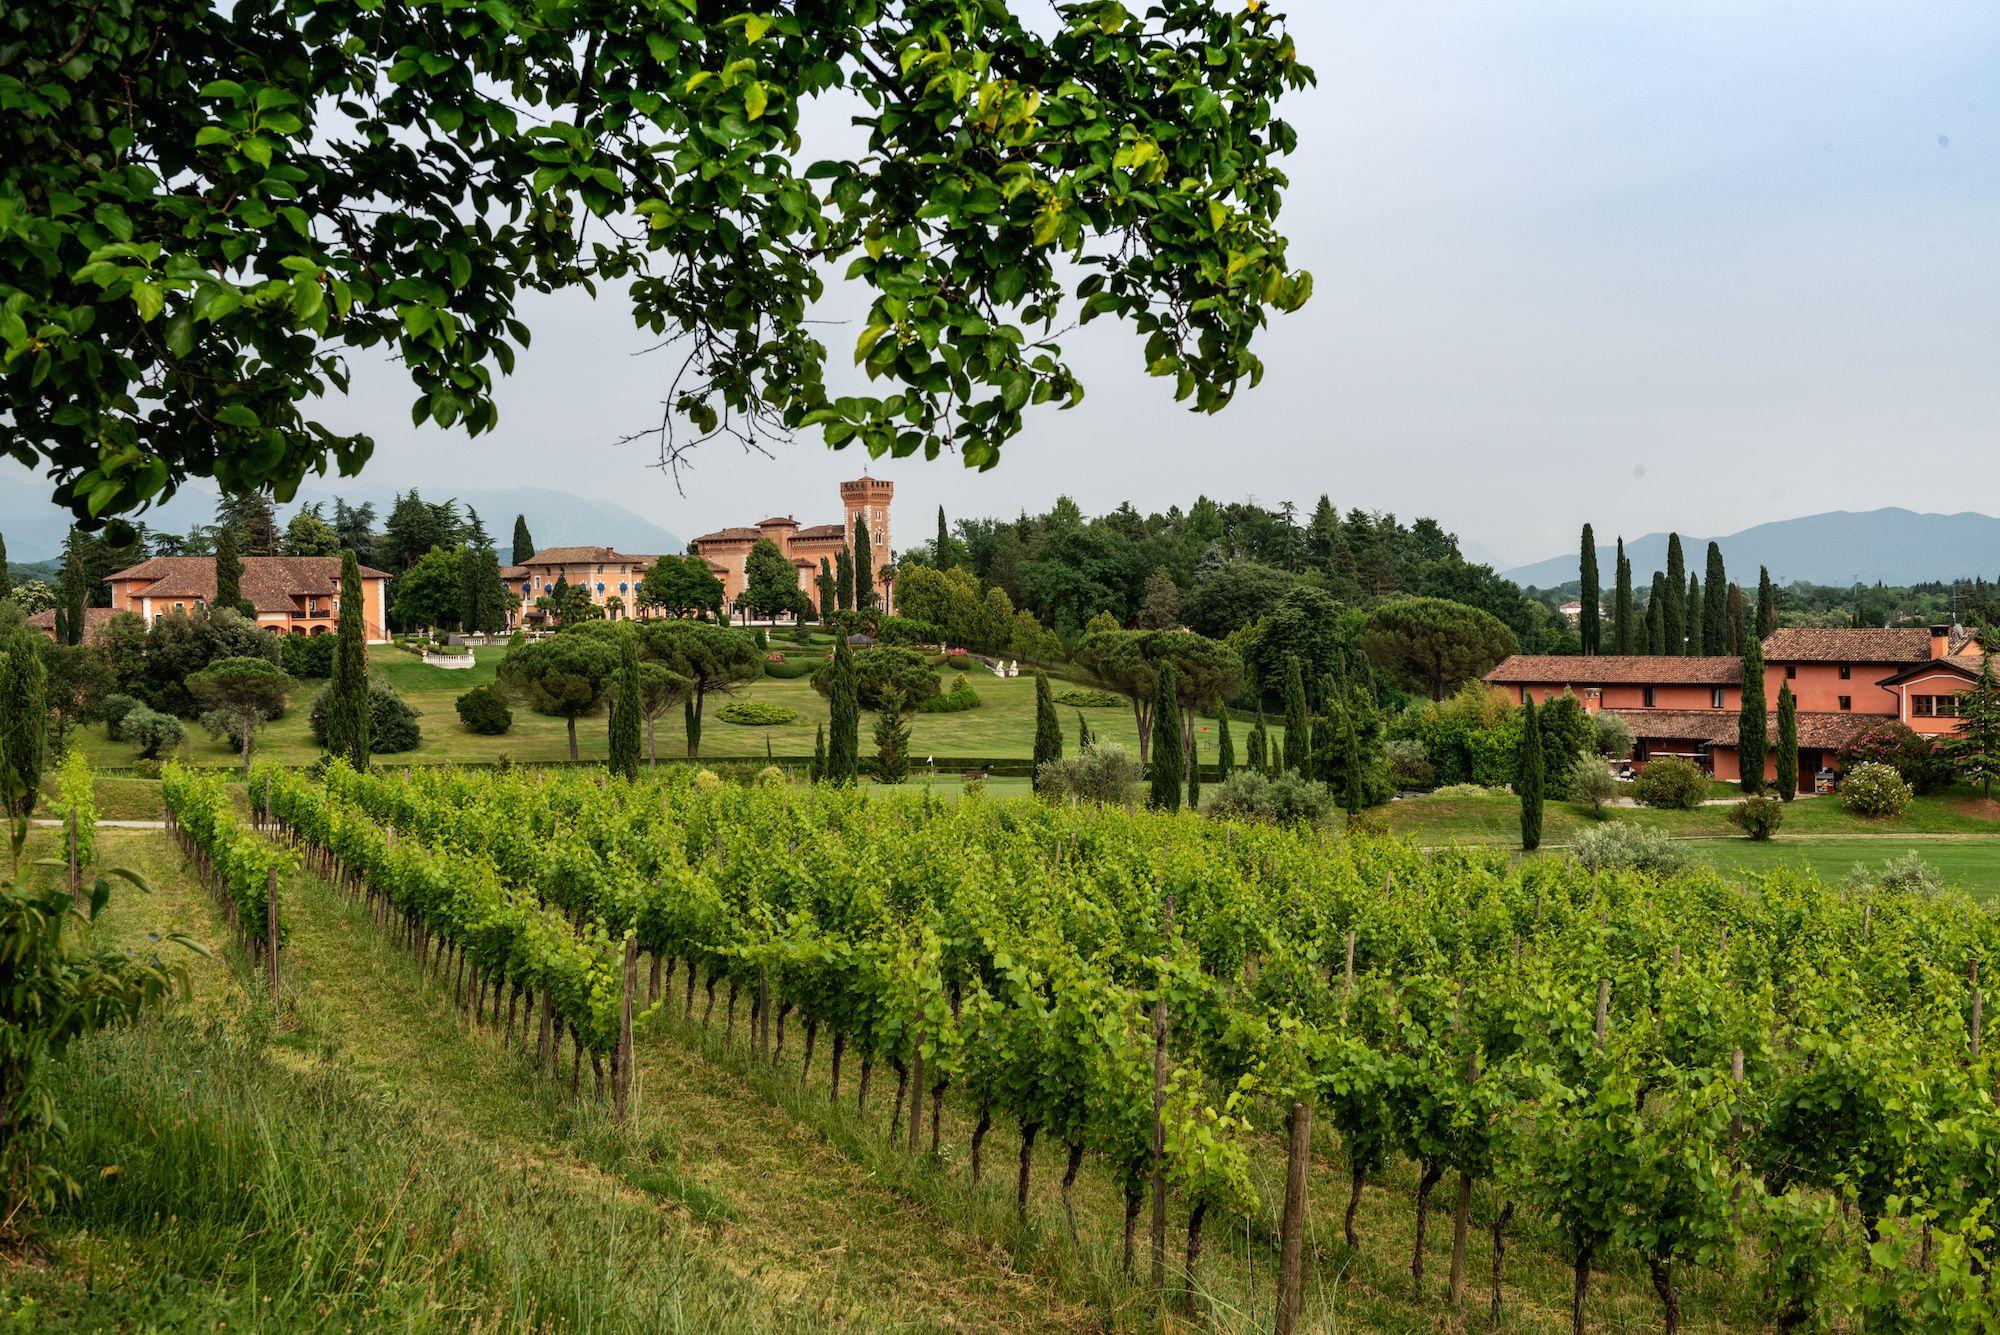 #WineResort, tappa tra i vini friulani più esclusivi